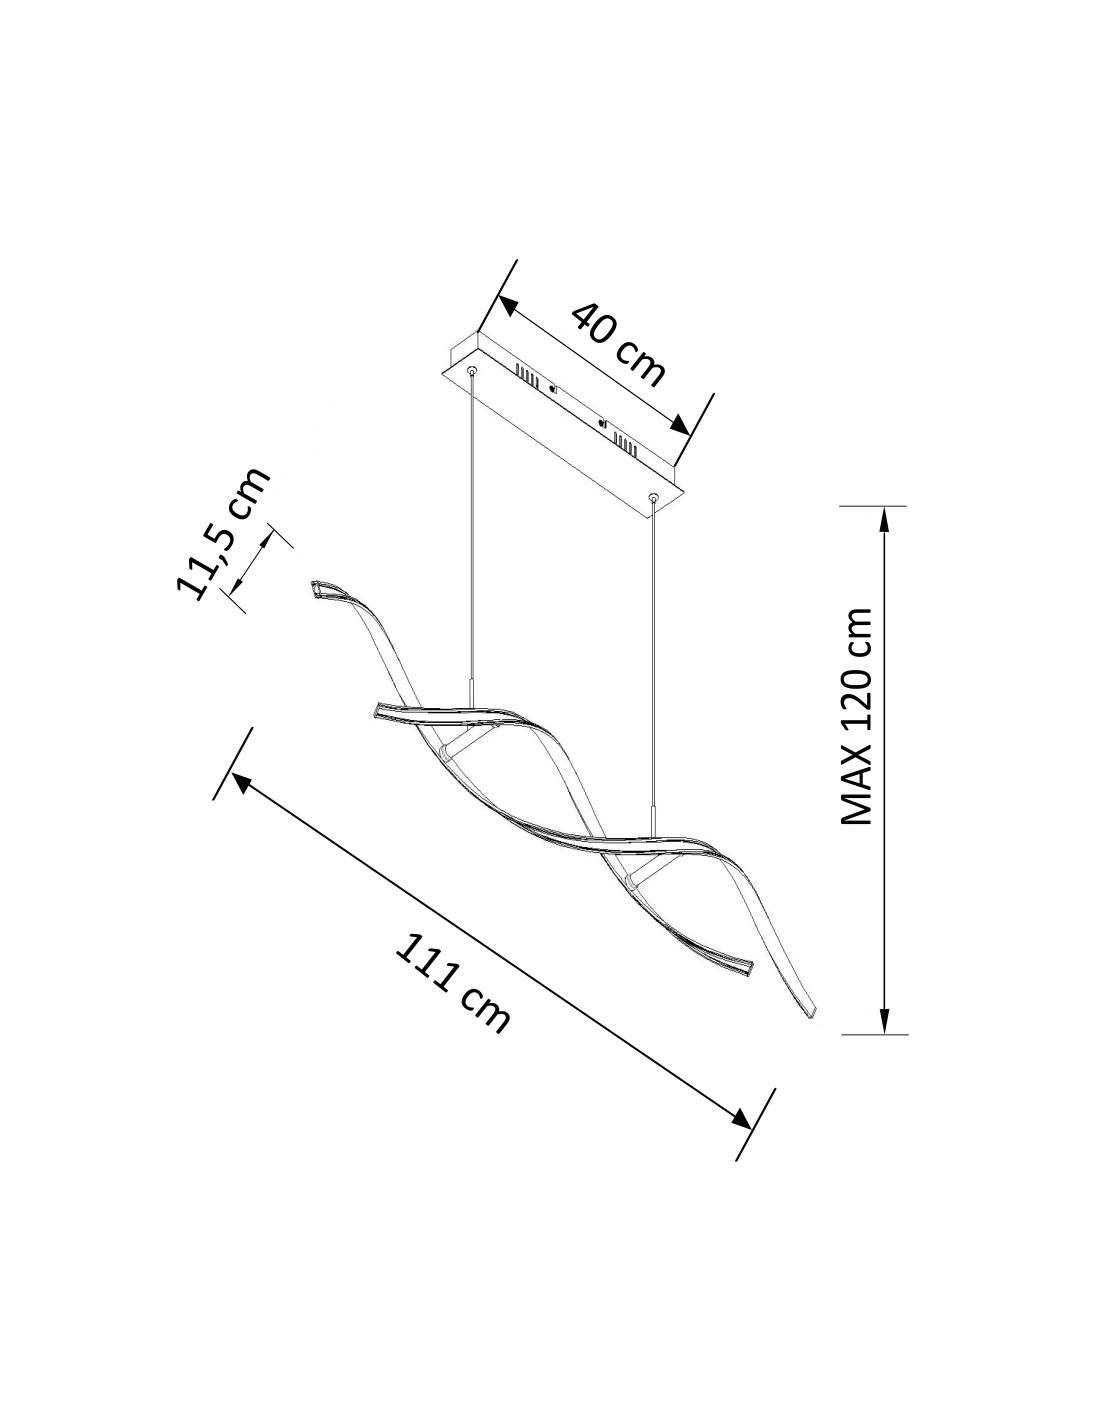 Pendant Light Led Design 2 Long Wavy Bars 110 Cm 20w